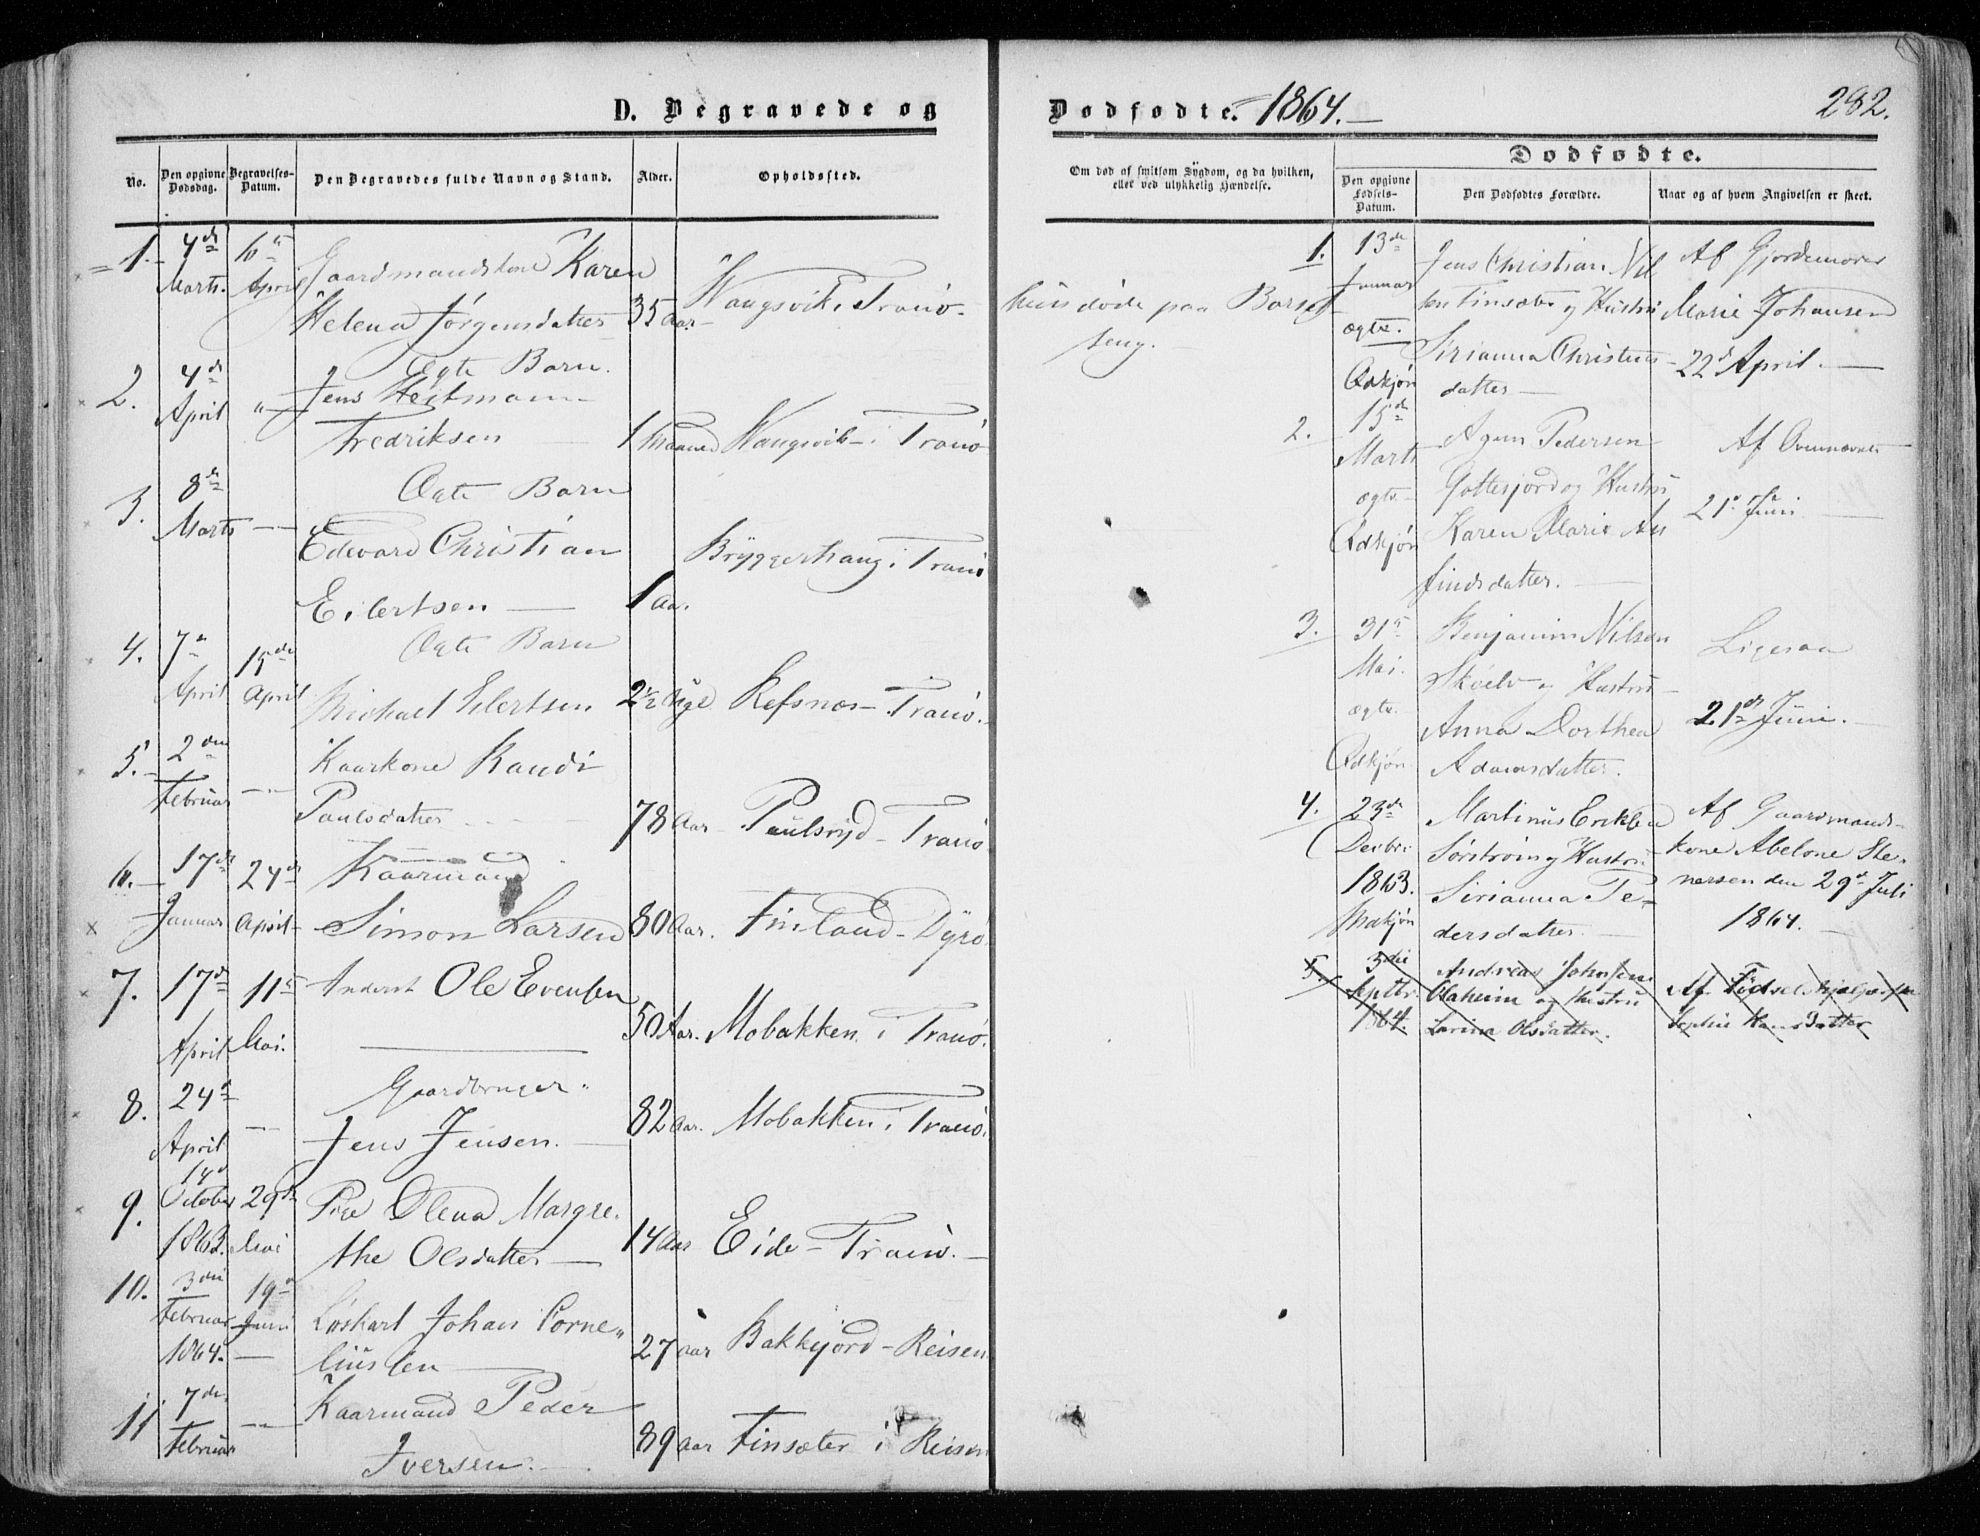 SATØ, Tranøy sokneprestkontor, I/Ia/Iaa/L0007kirke: Ministerialbok nr. 7, 1856-1866, s. 282